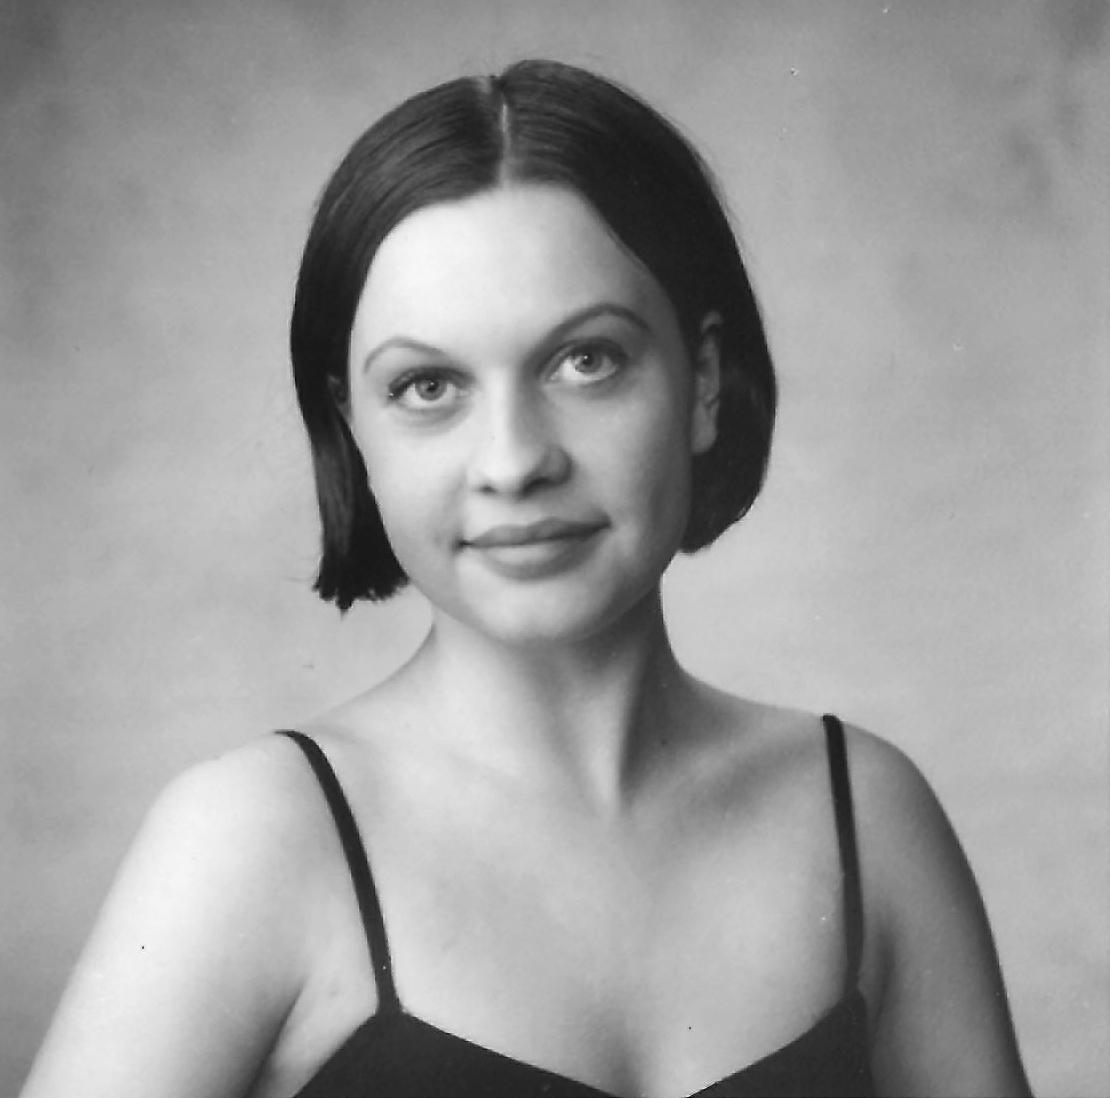 Christina erlandsen